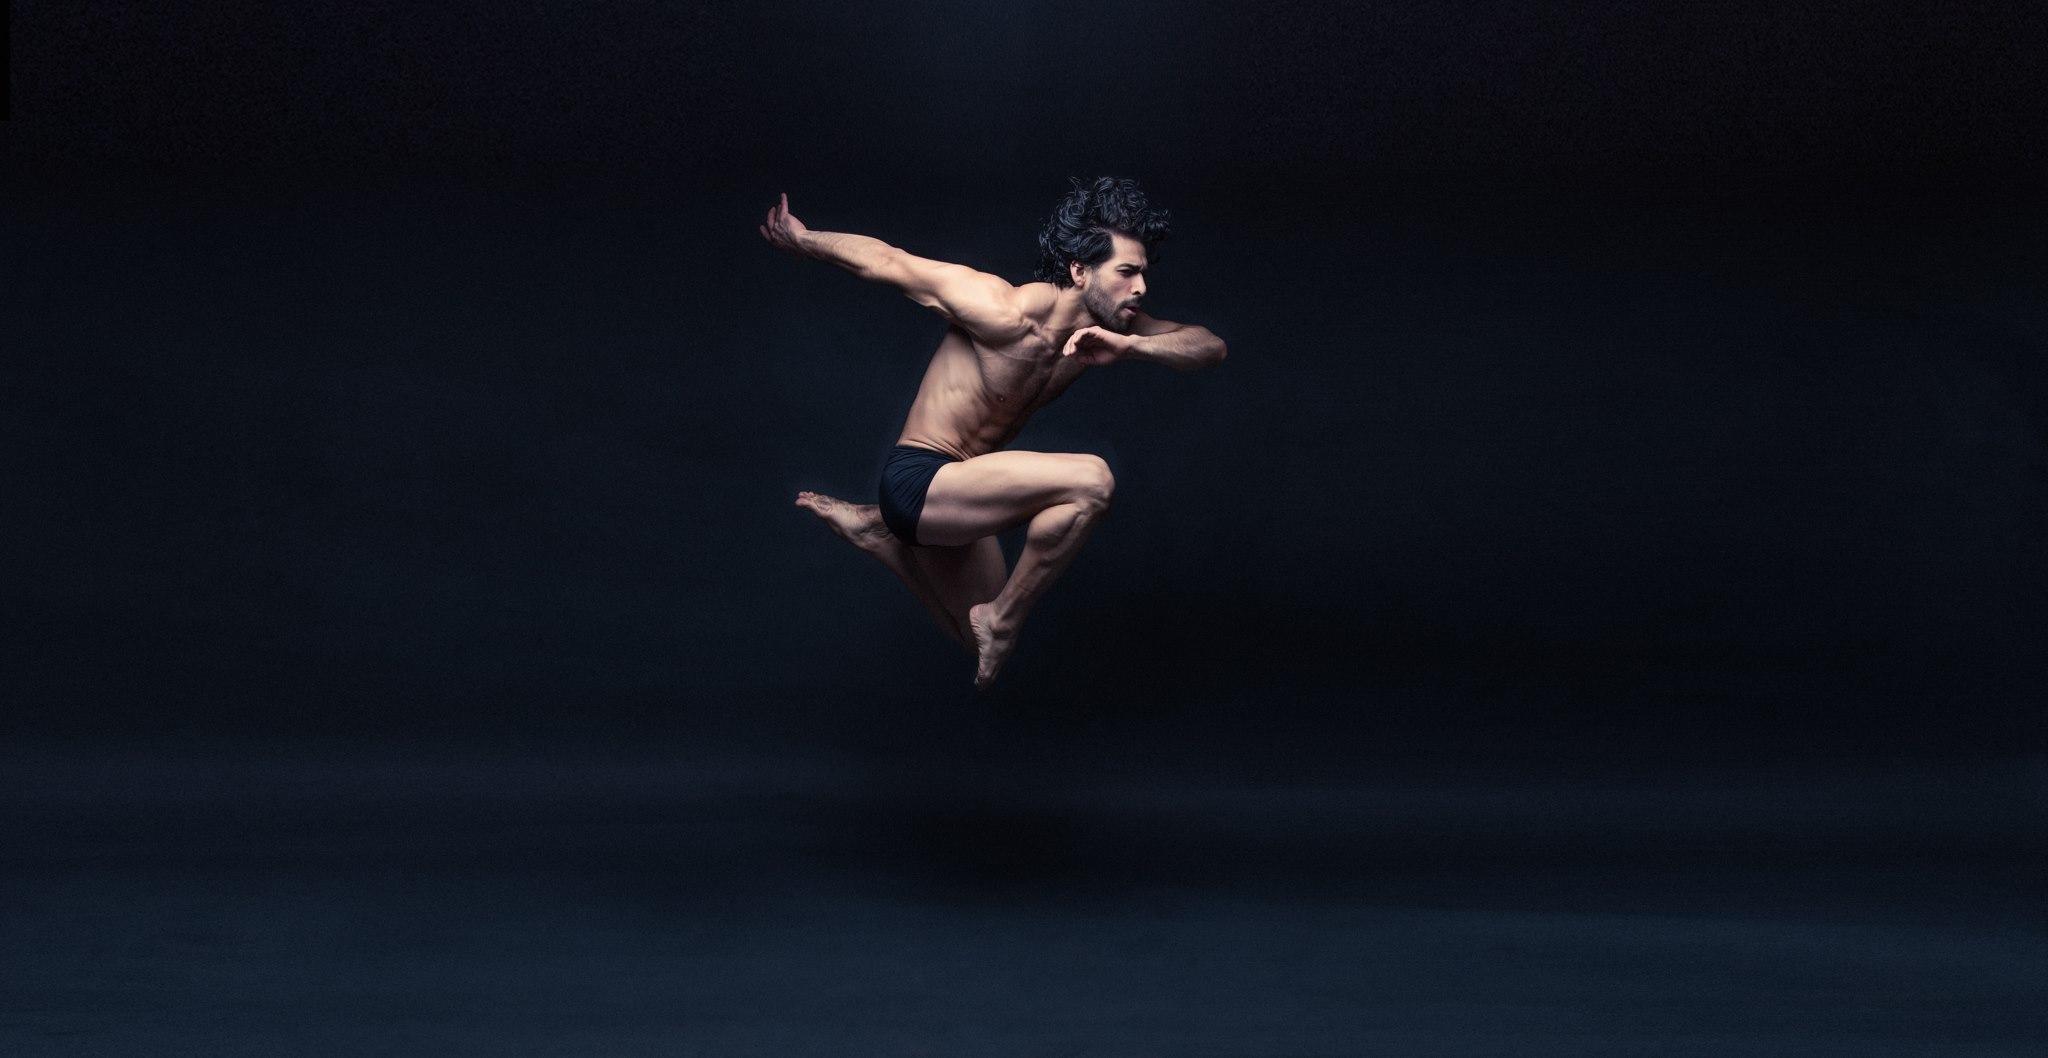 Carlos Alvarado Photography J.jpg